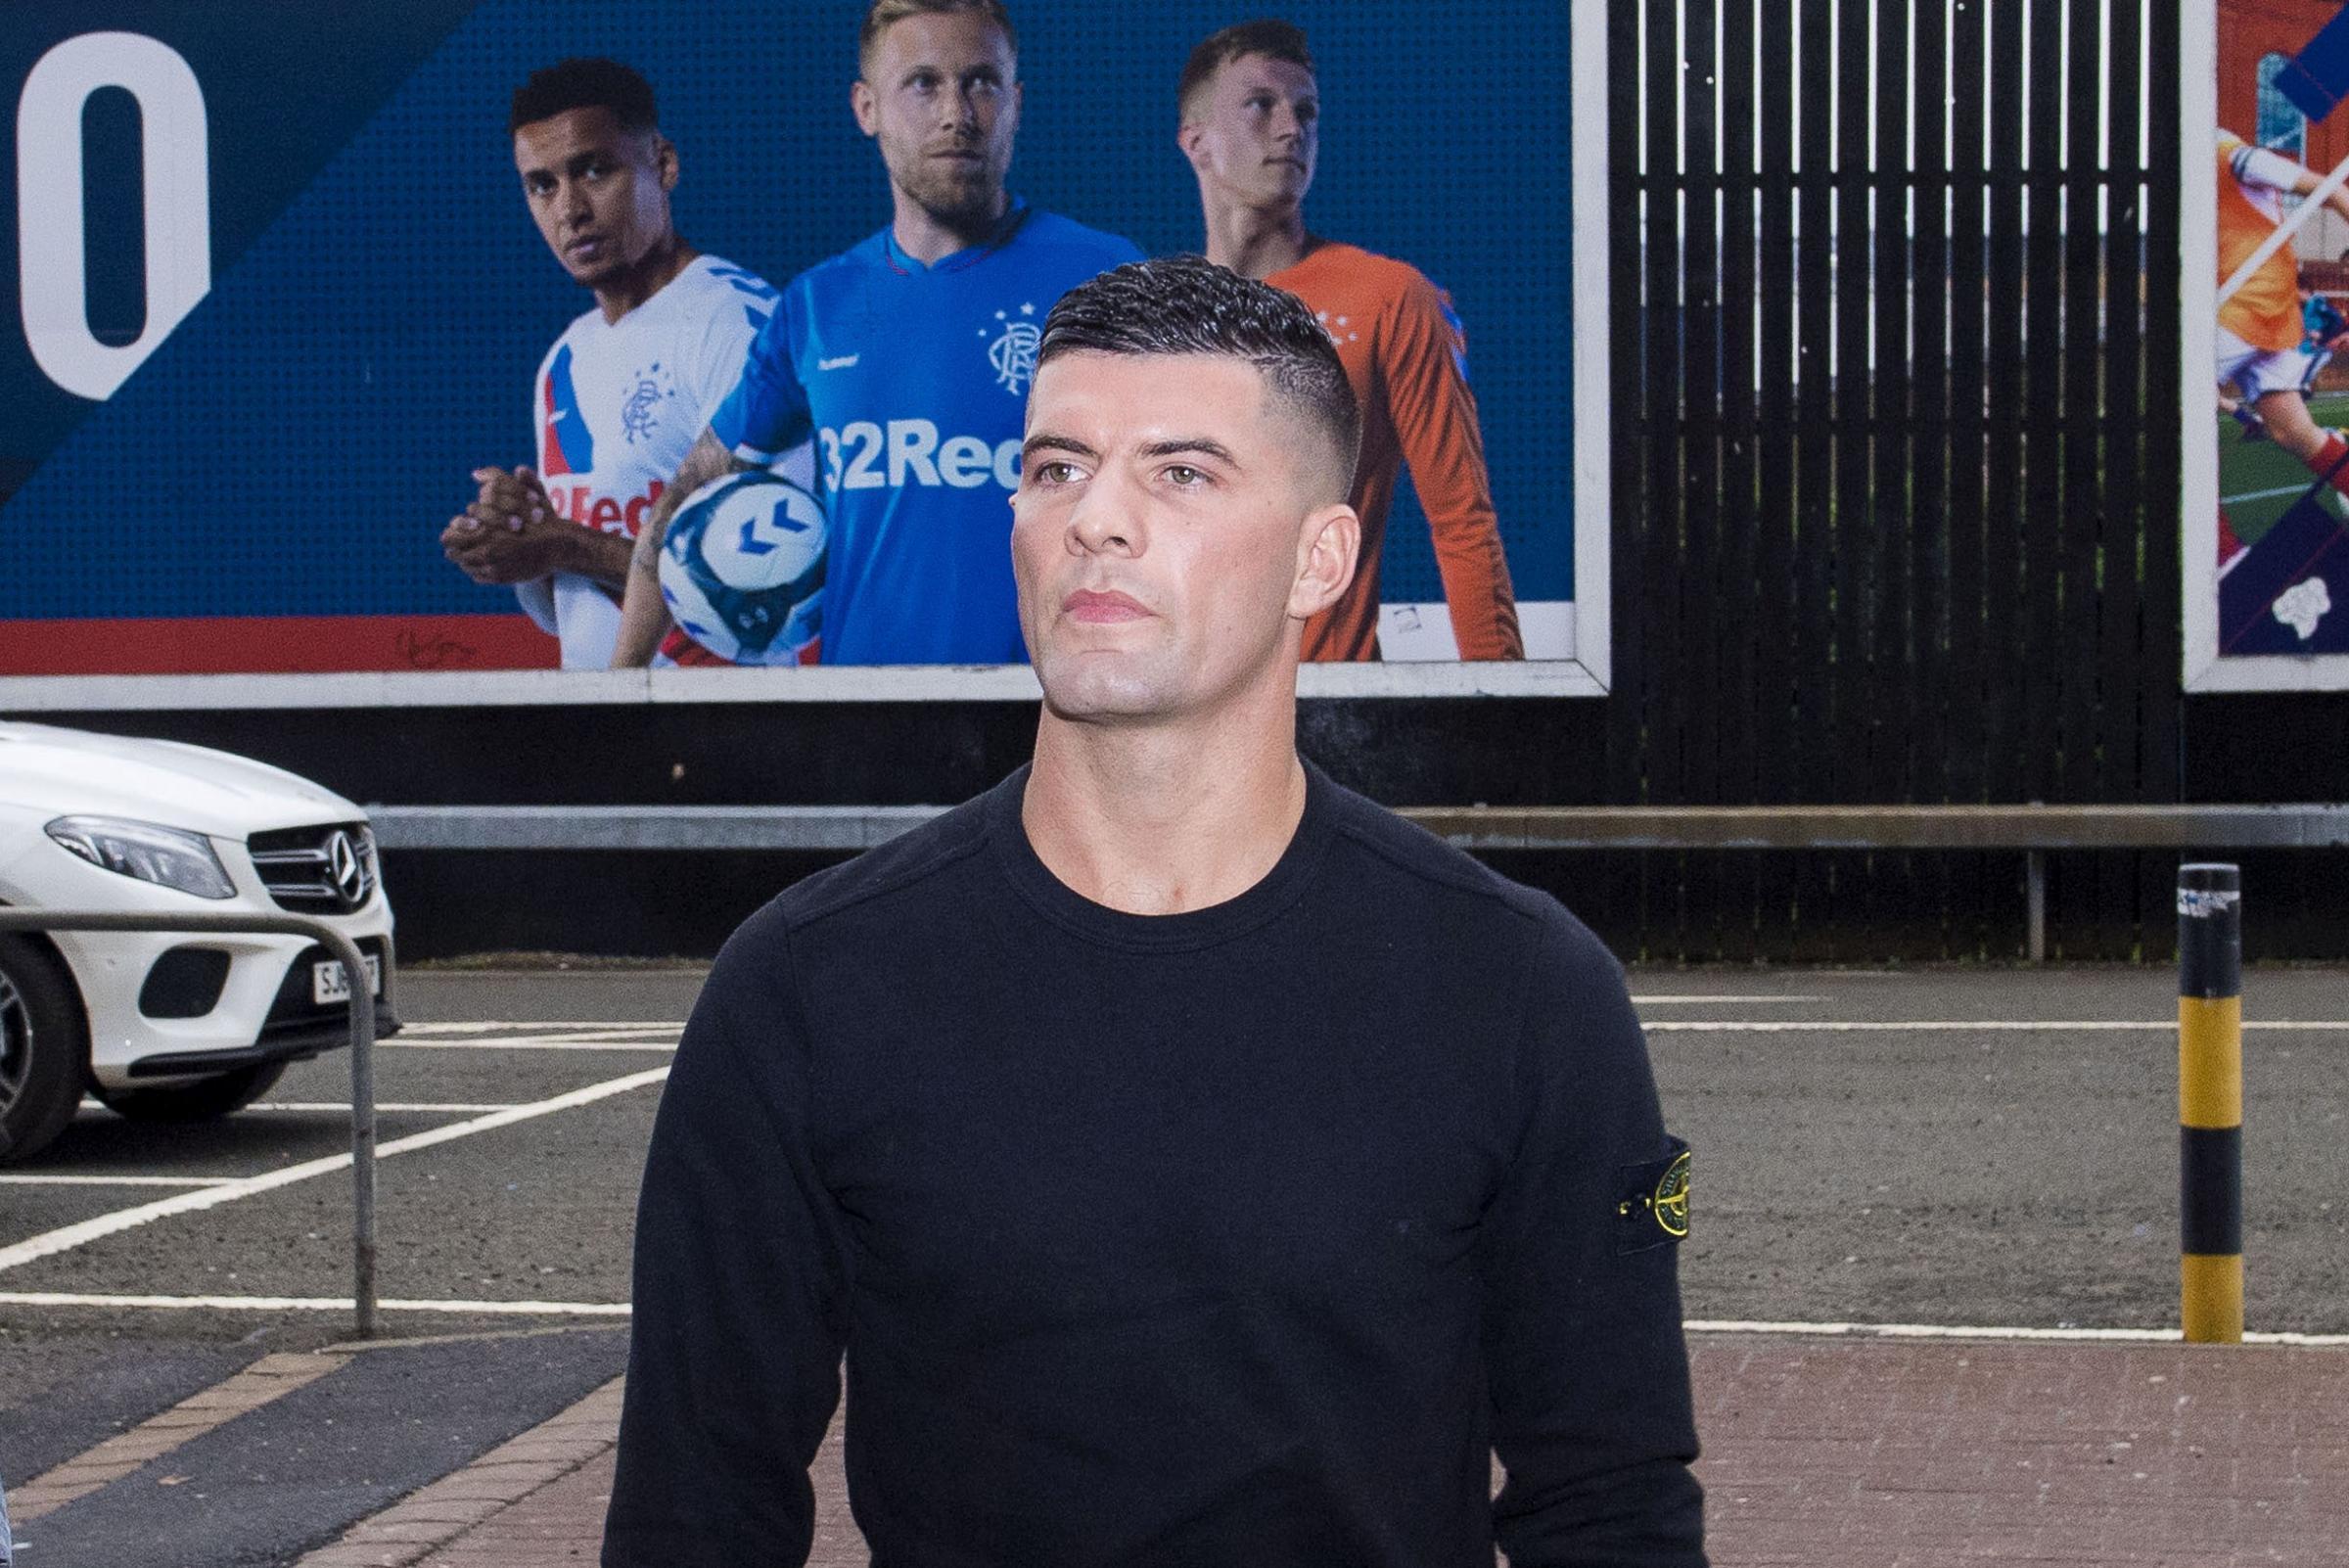 Graeme McGarry: Rangers-bound Jordan Jones faces uphill battle to win back Kilmarnock faithful